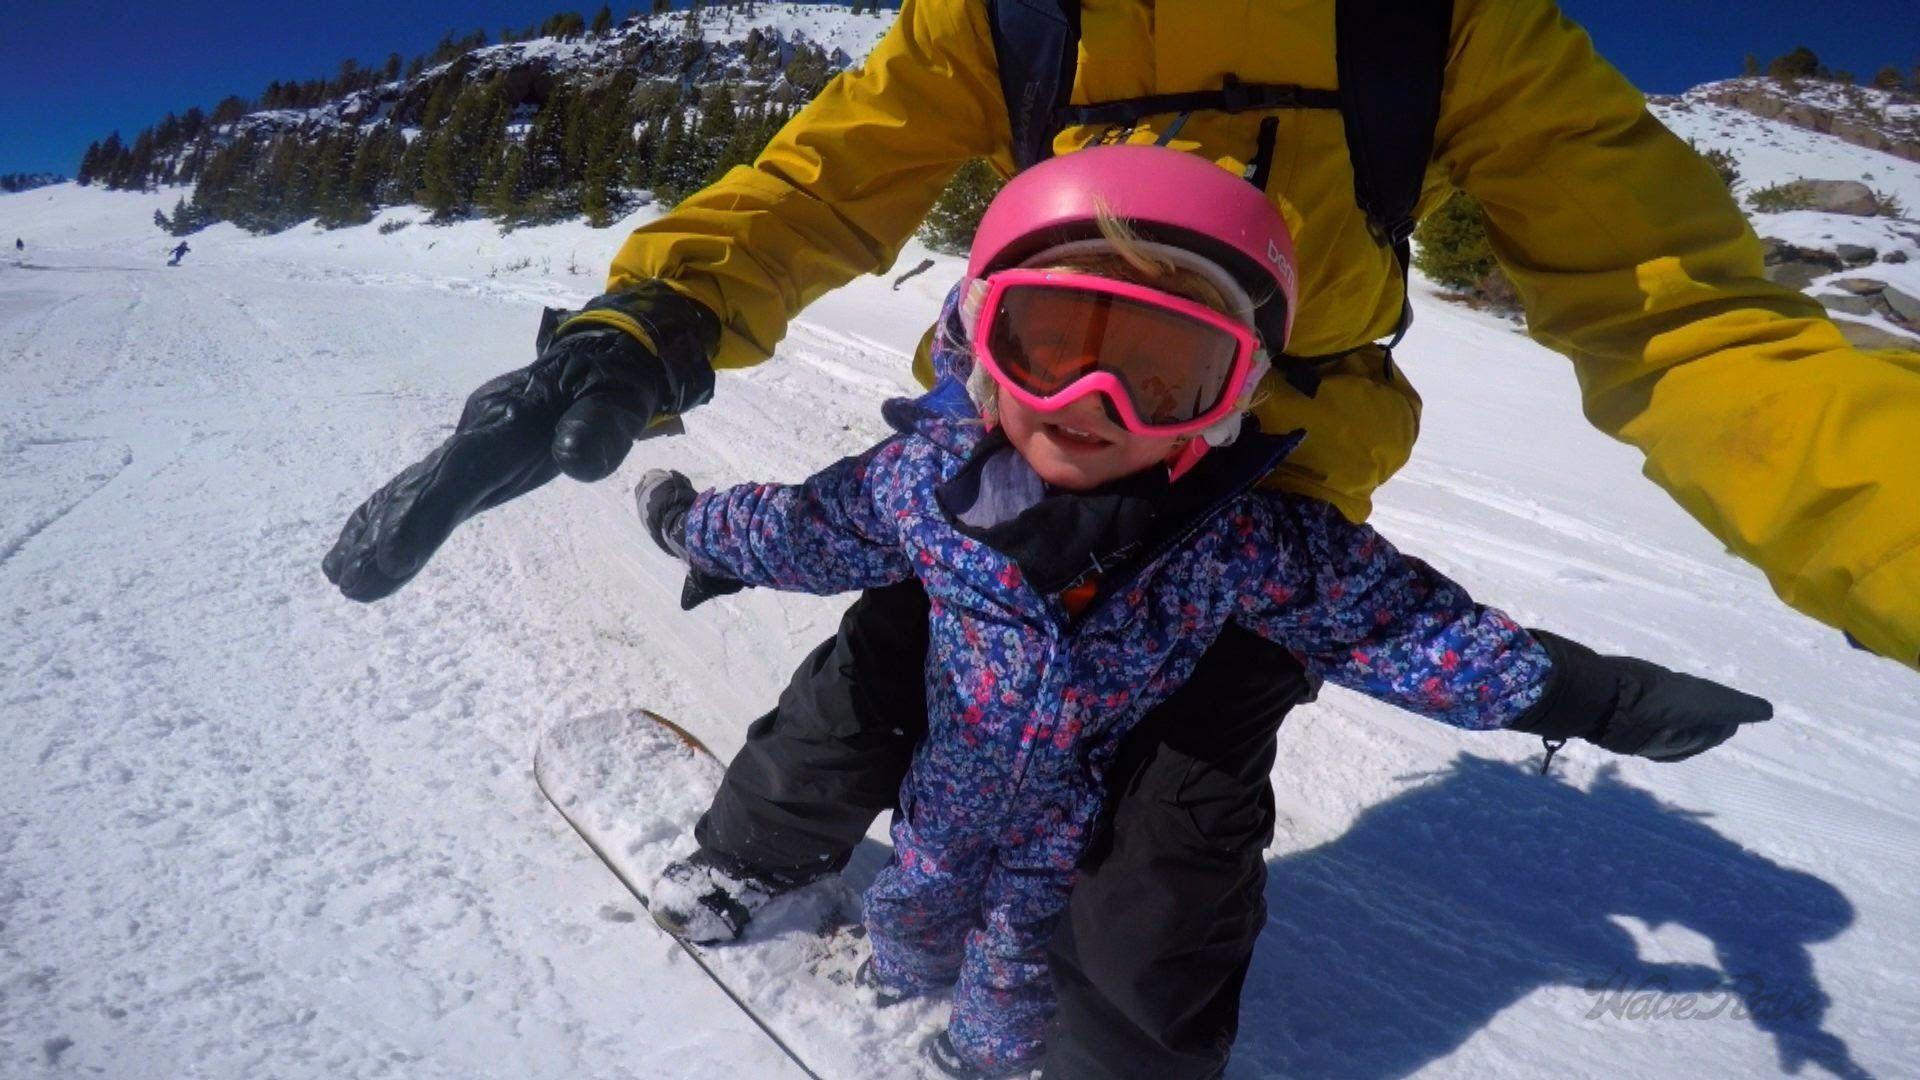 Tandem Snowboarding Friends Kids Snowboarding Snowboarding Snowboard